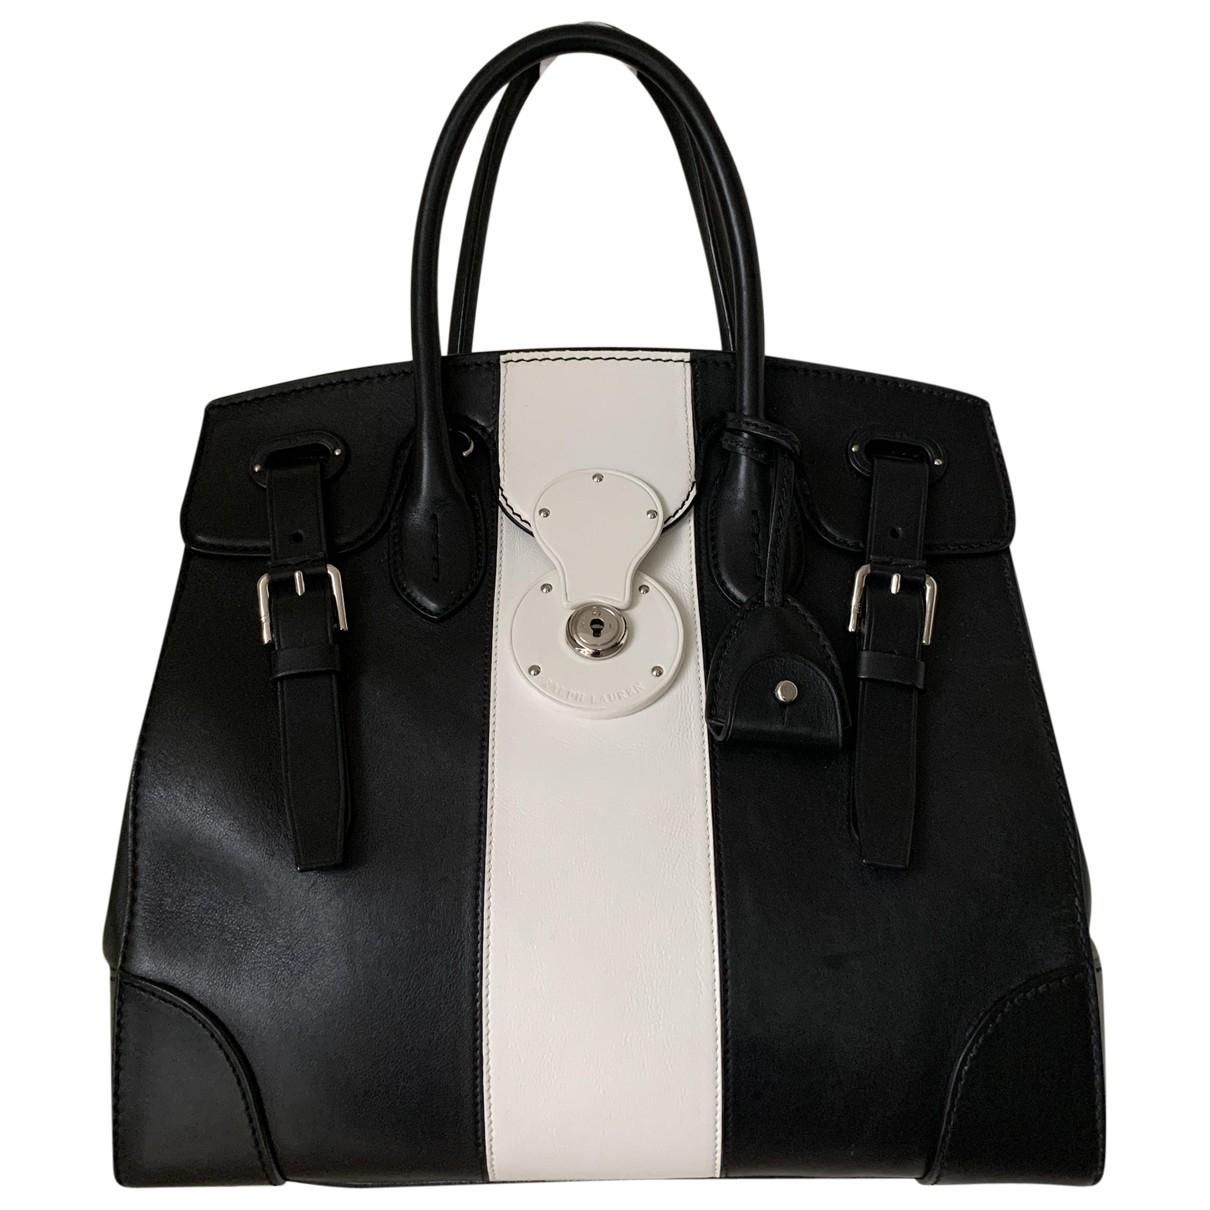 Ralph Lauren \N Leather handbag for Women \N